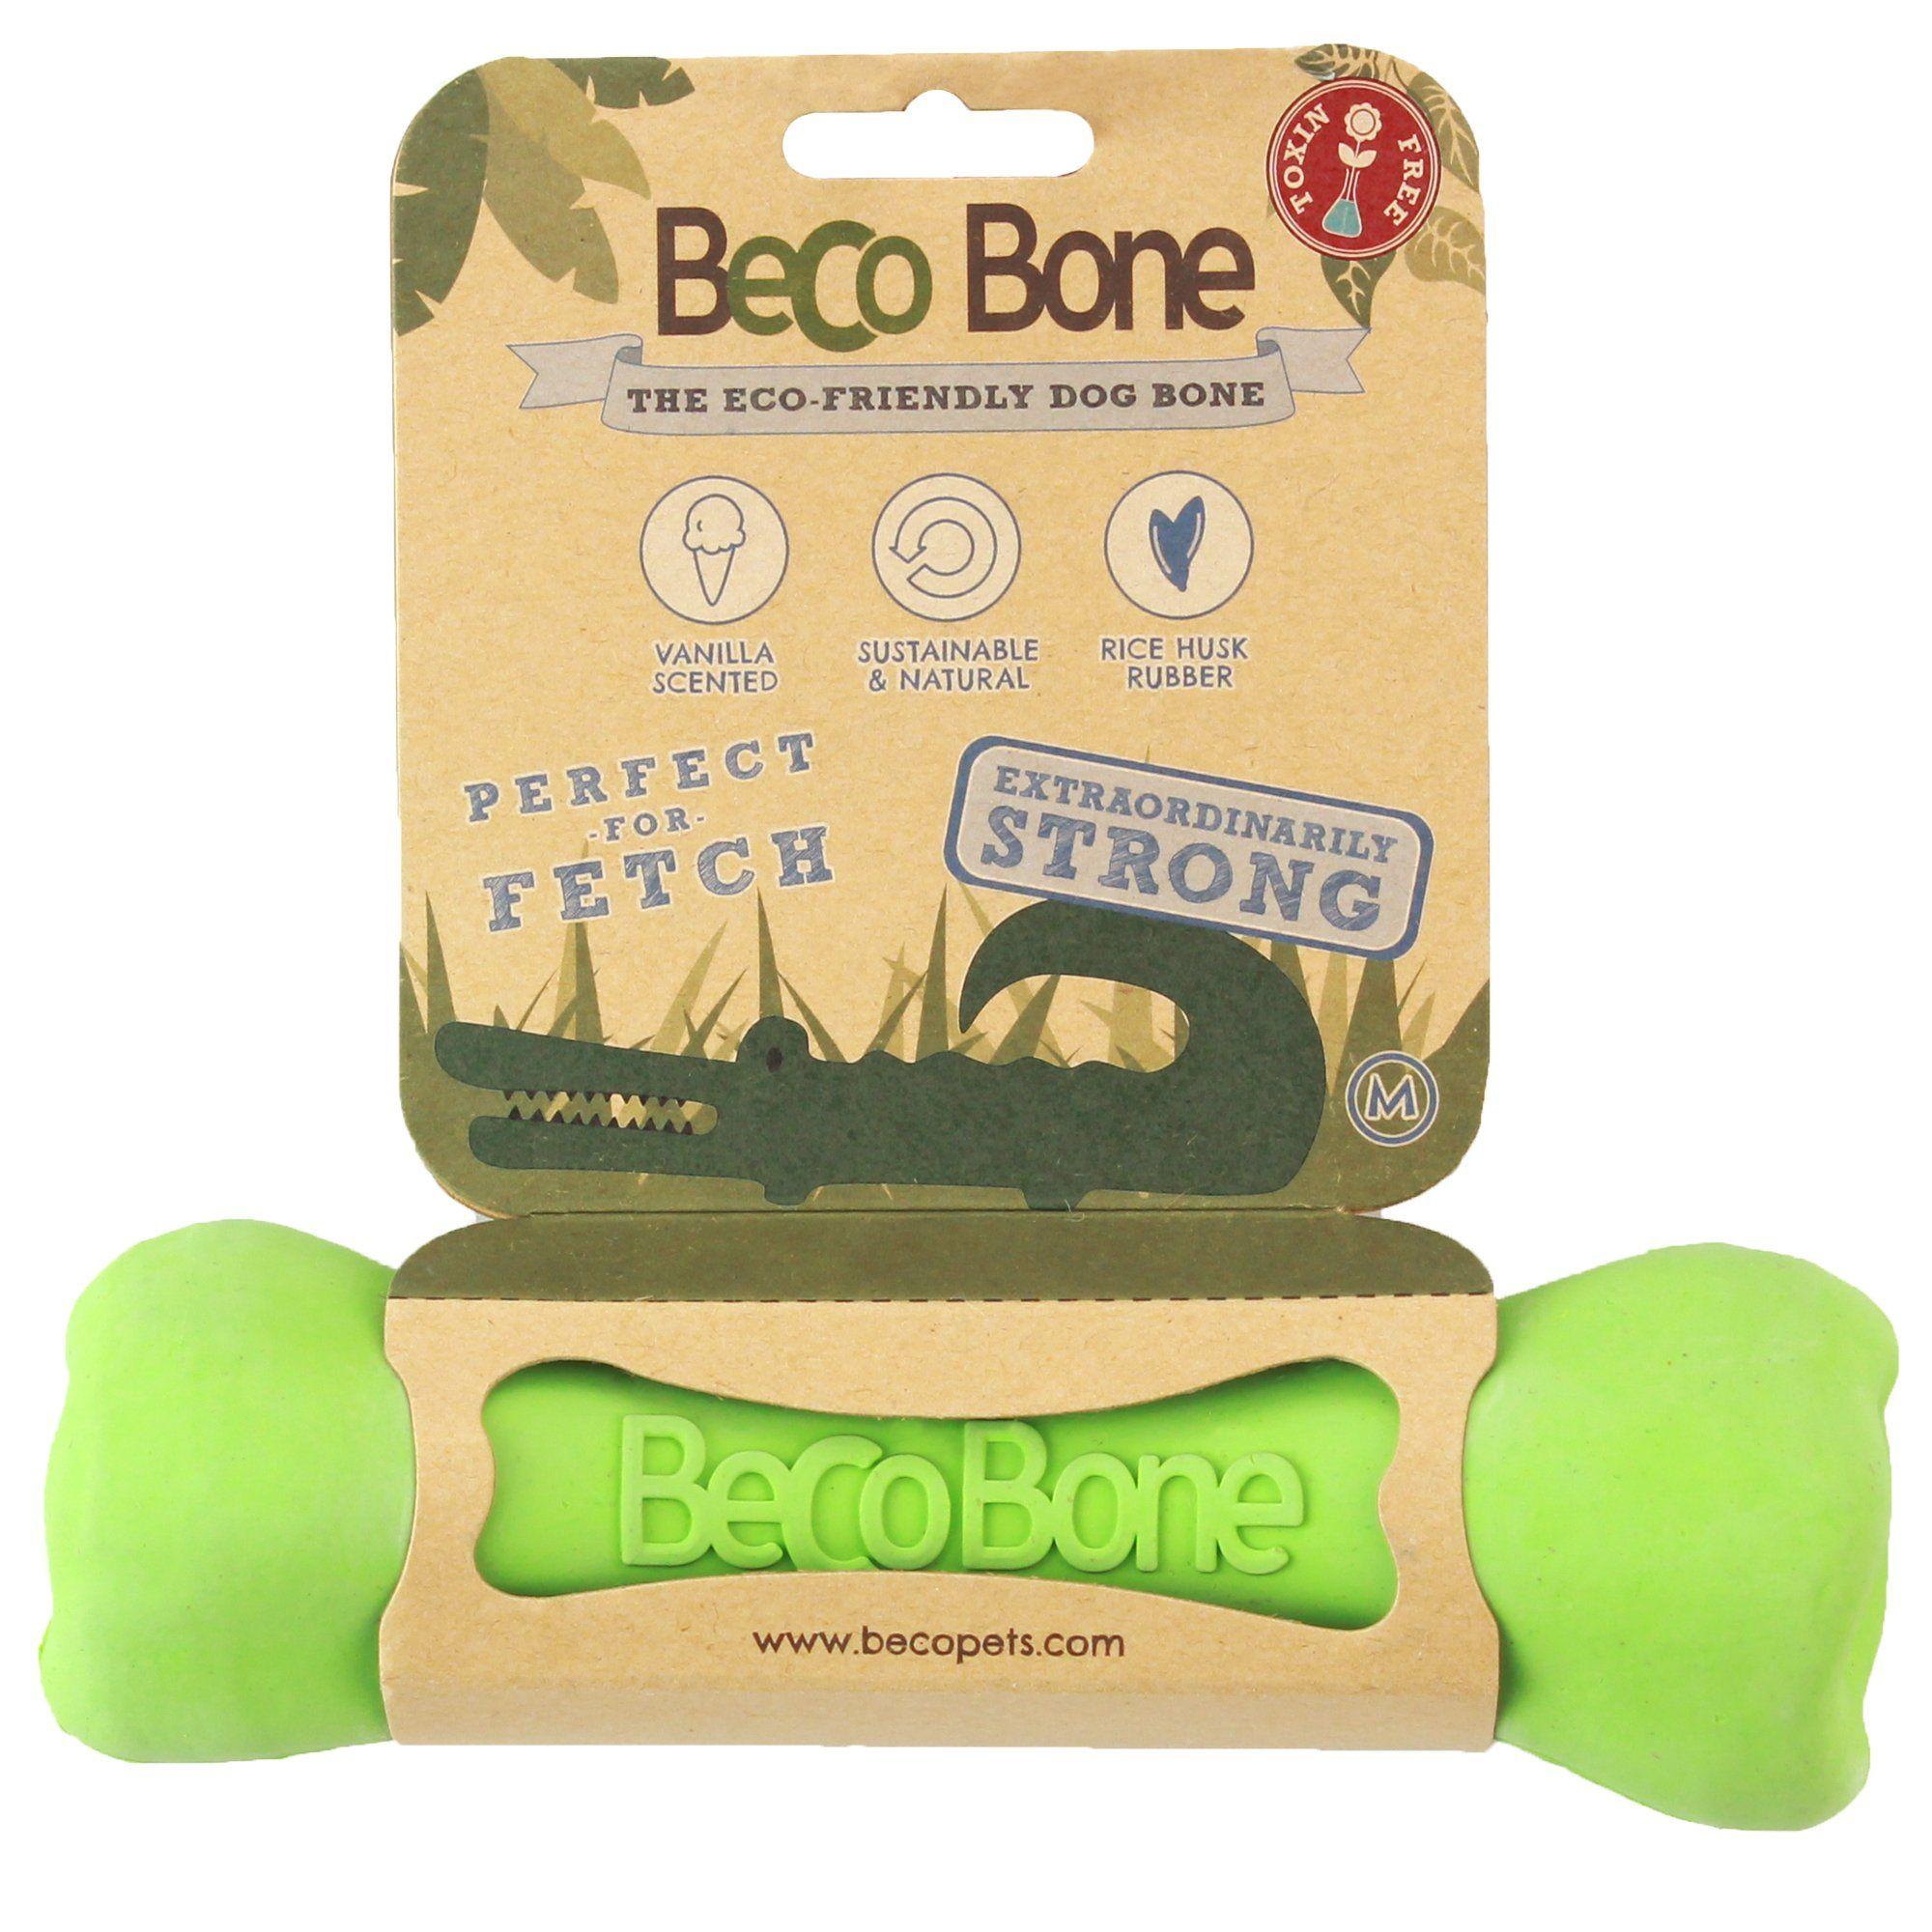 Beco Pet Bone Green Dog Toy Medium Dog Toys Dogs Cockapoo Dog